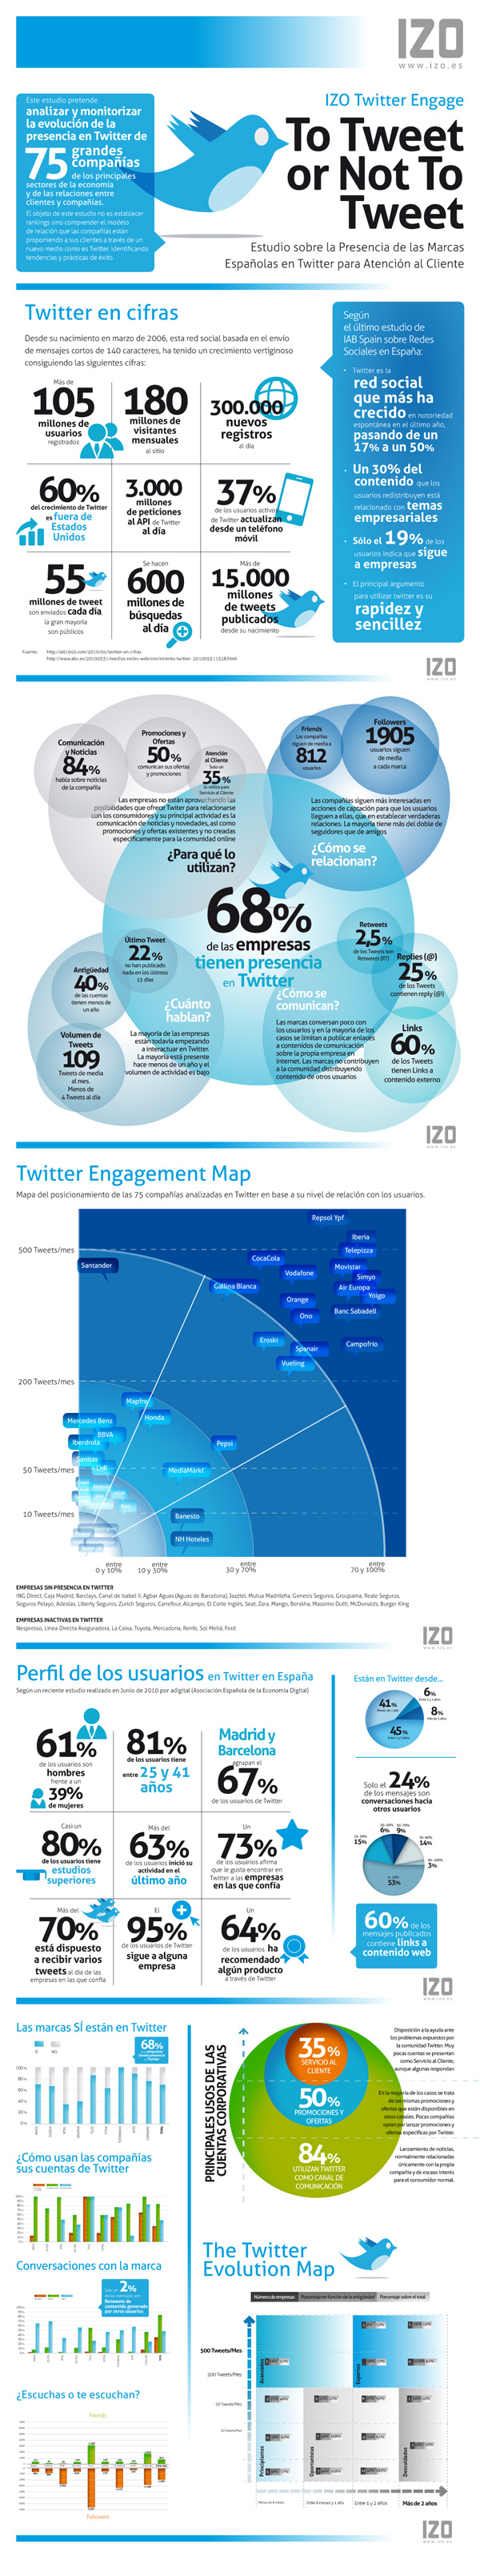 estudio-uso-twitter